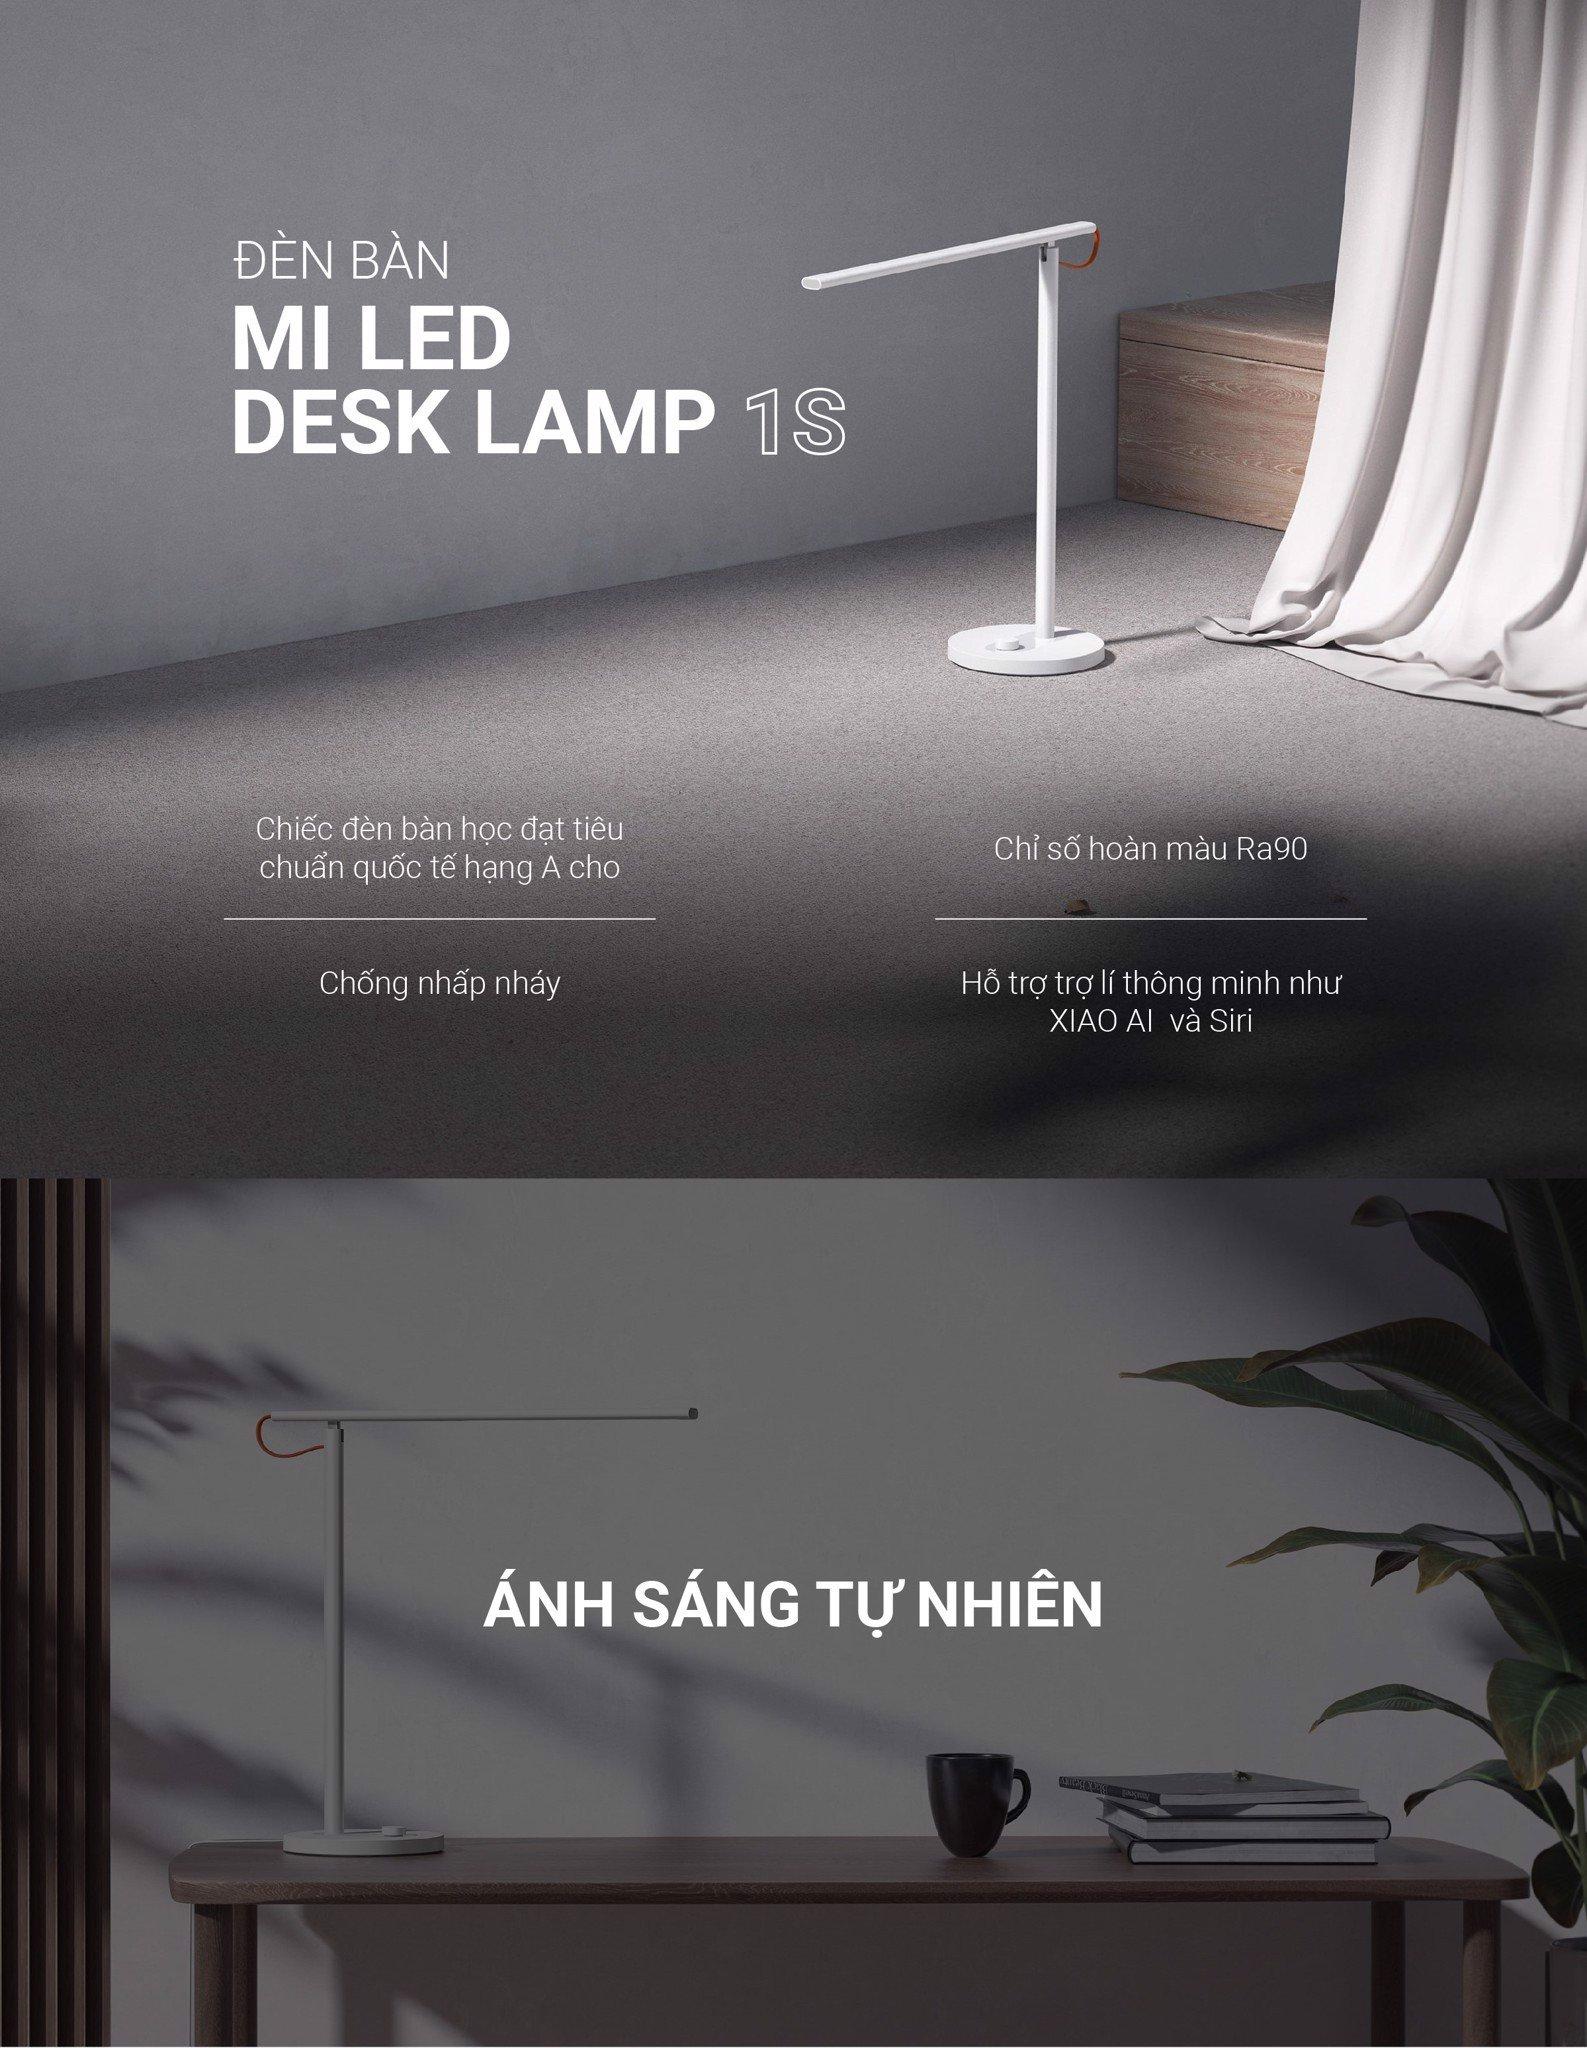 Đèn bàn Mi LED Desk Lamp 1S